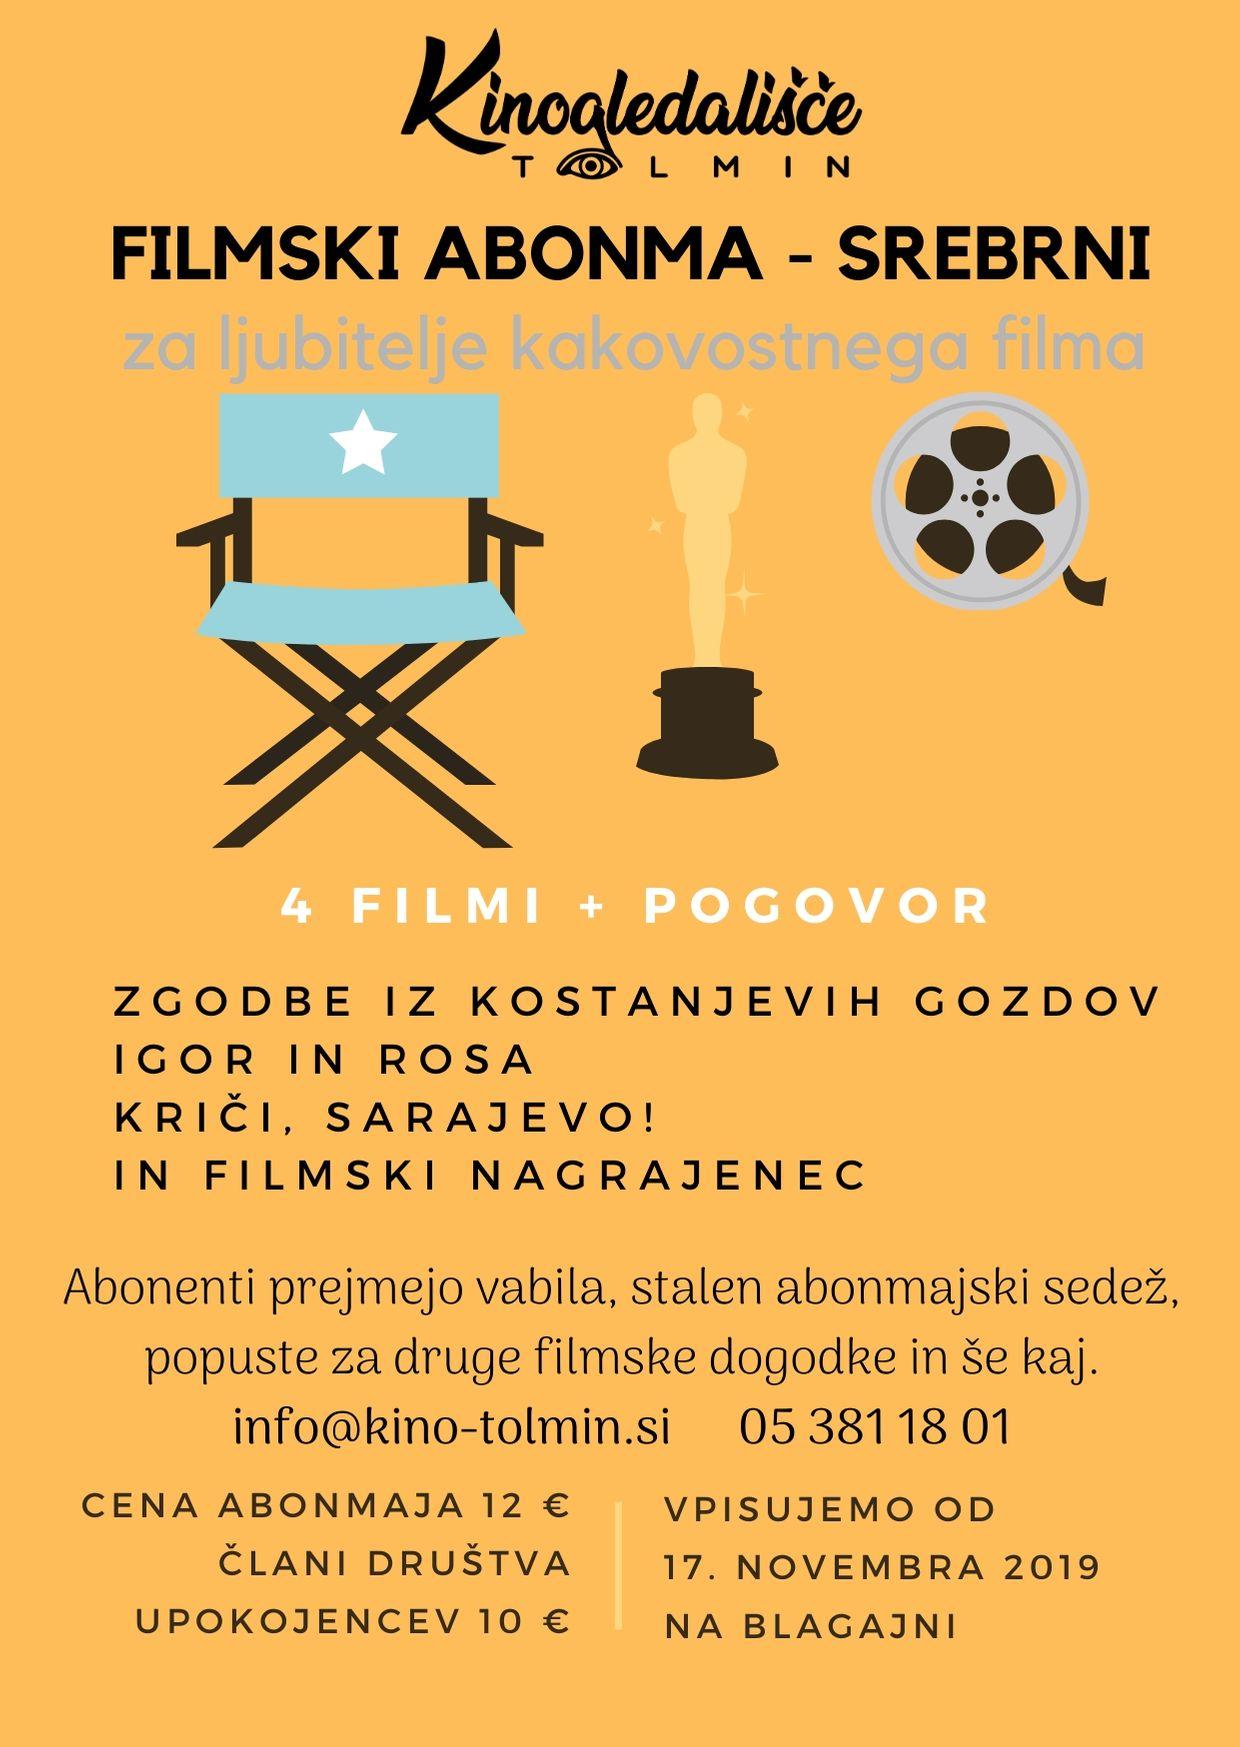 FILMSKI ABONMA - SREBRNI